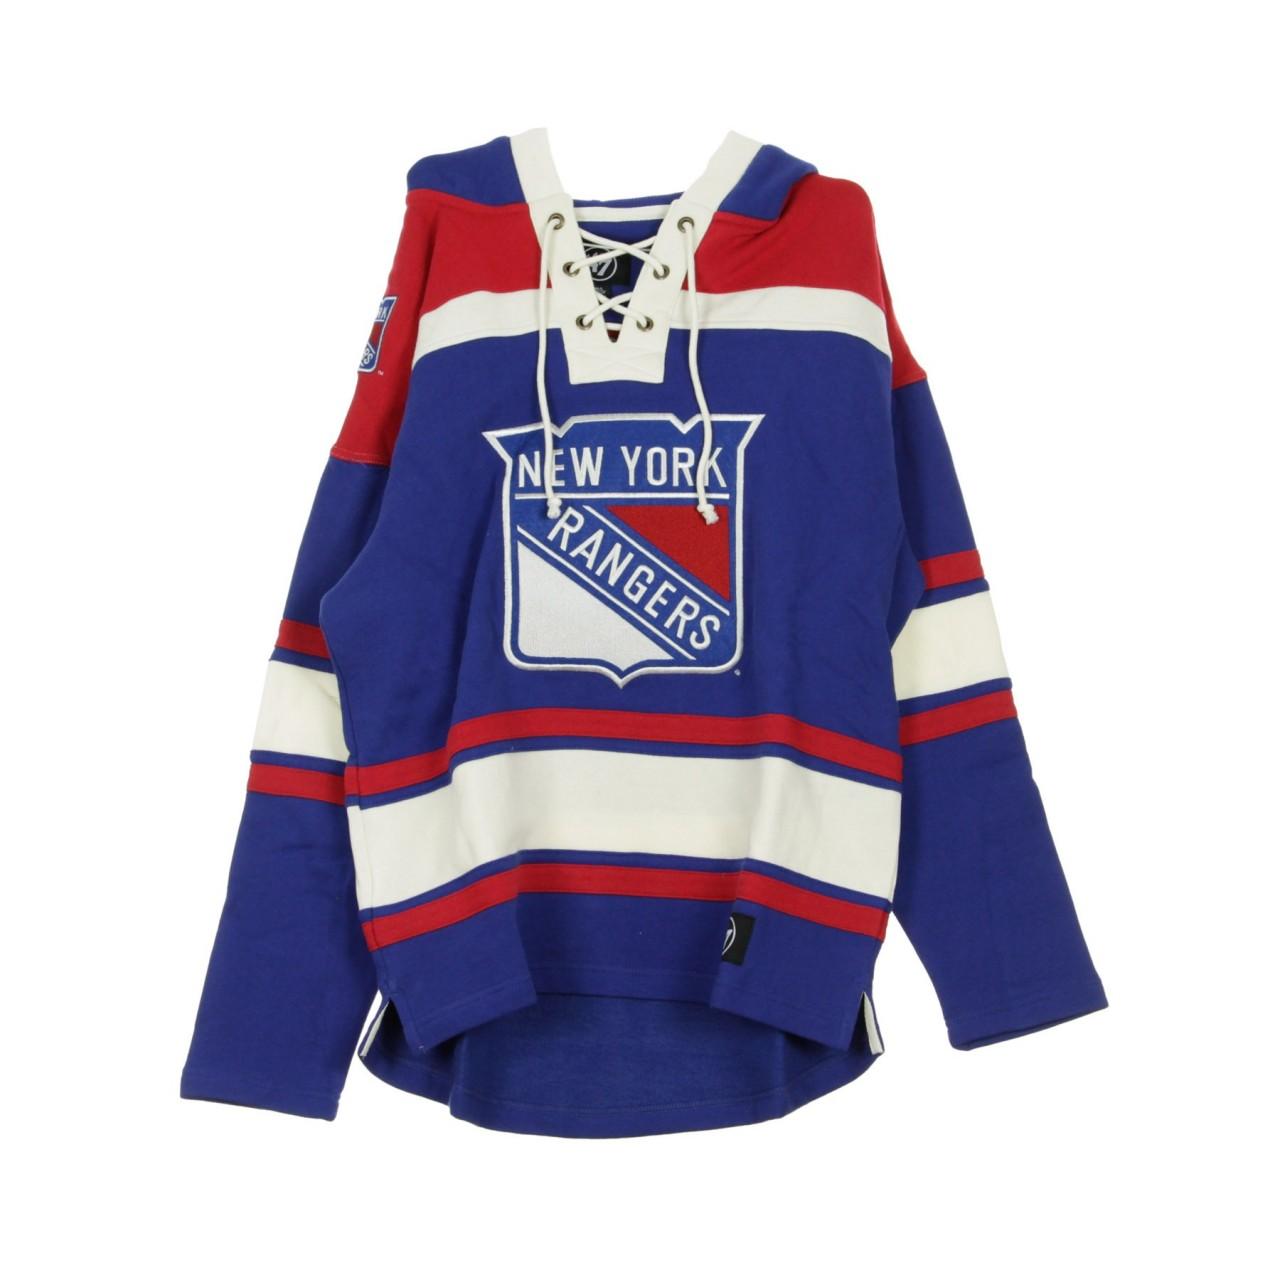 47 BRAND NHL LACER HOOD NEYRAN 345921